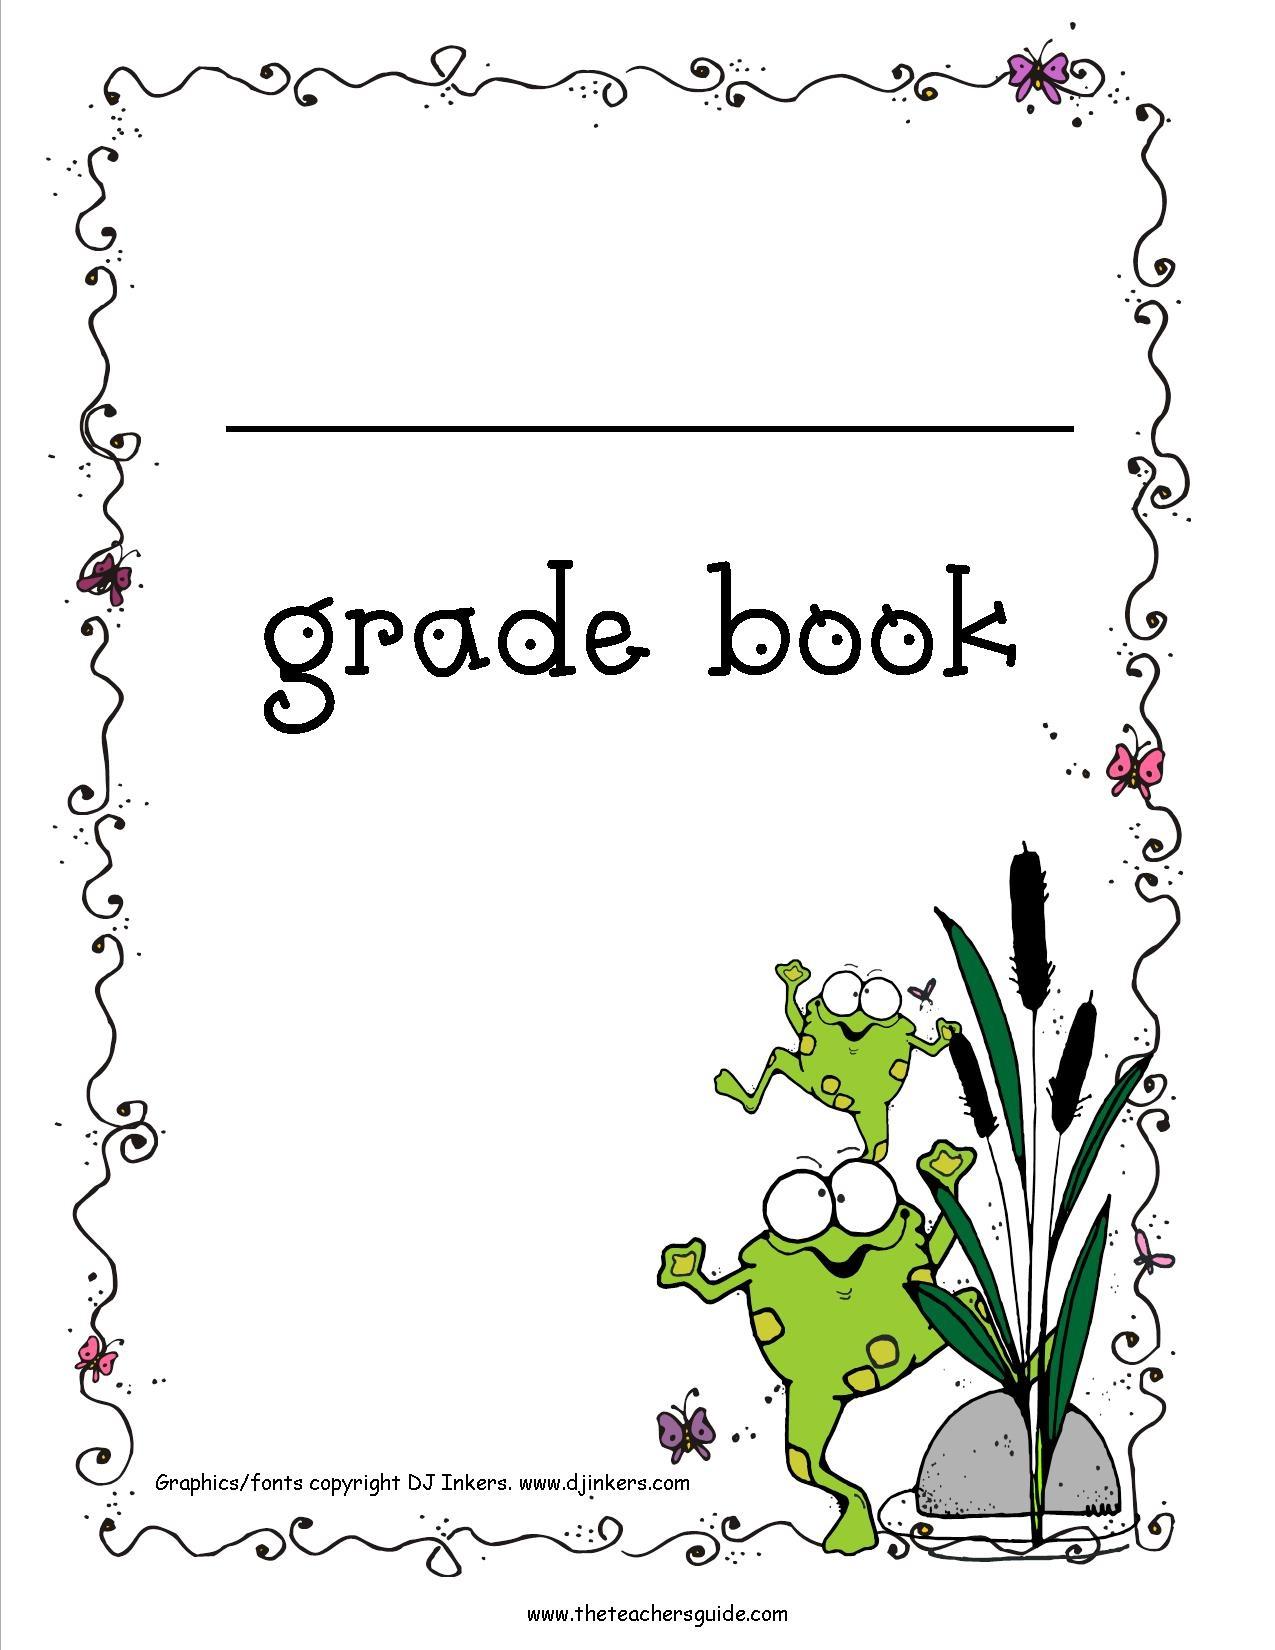 Free Printable Gradebook Sheets For Teachers